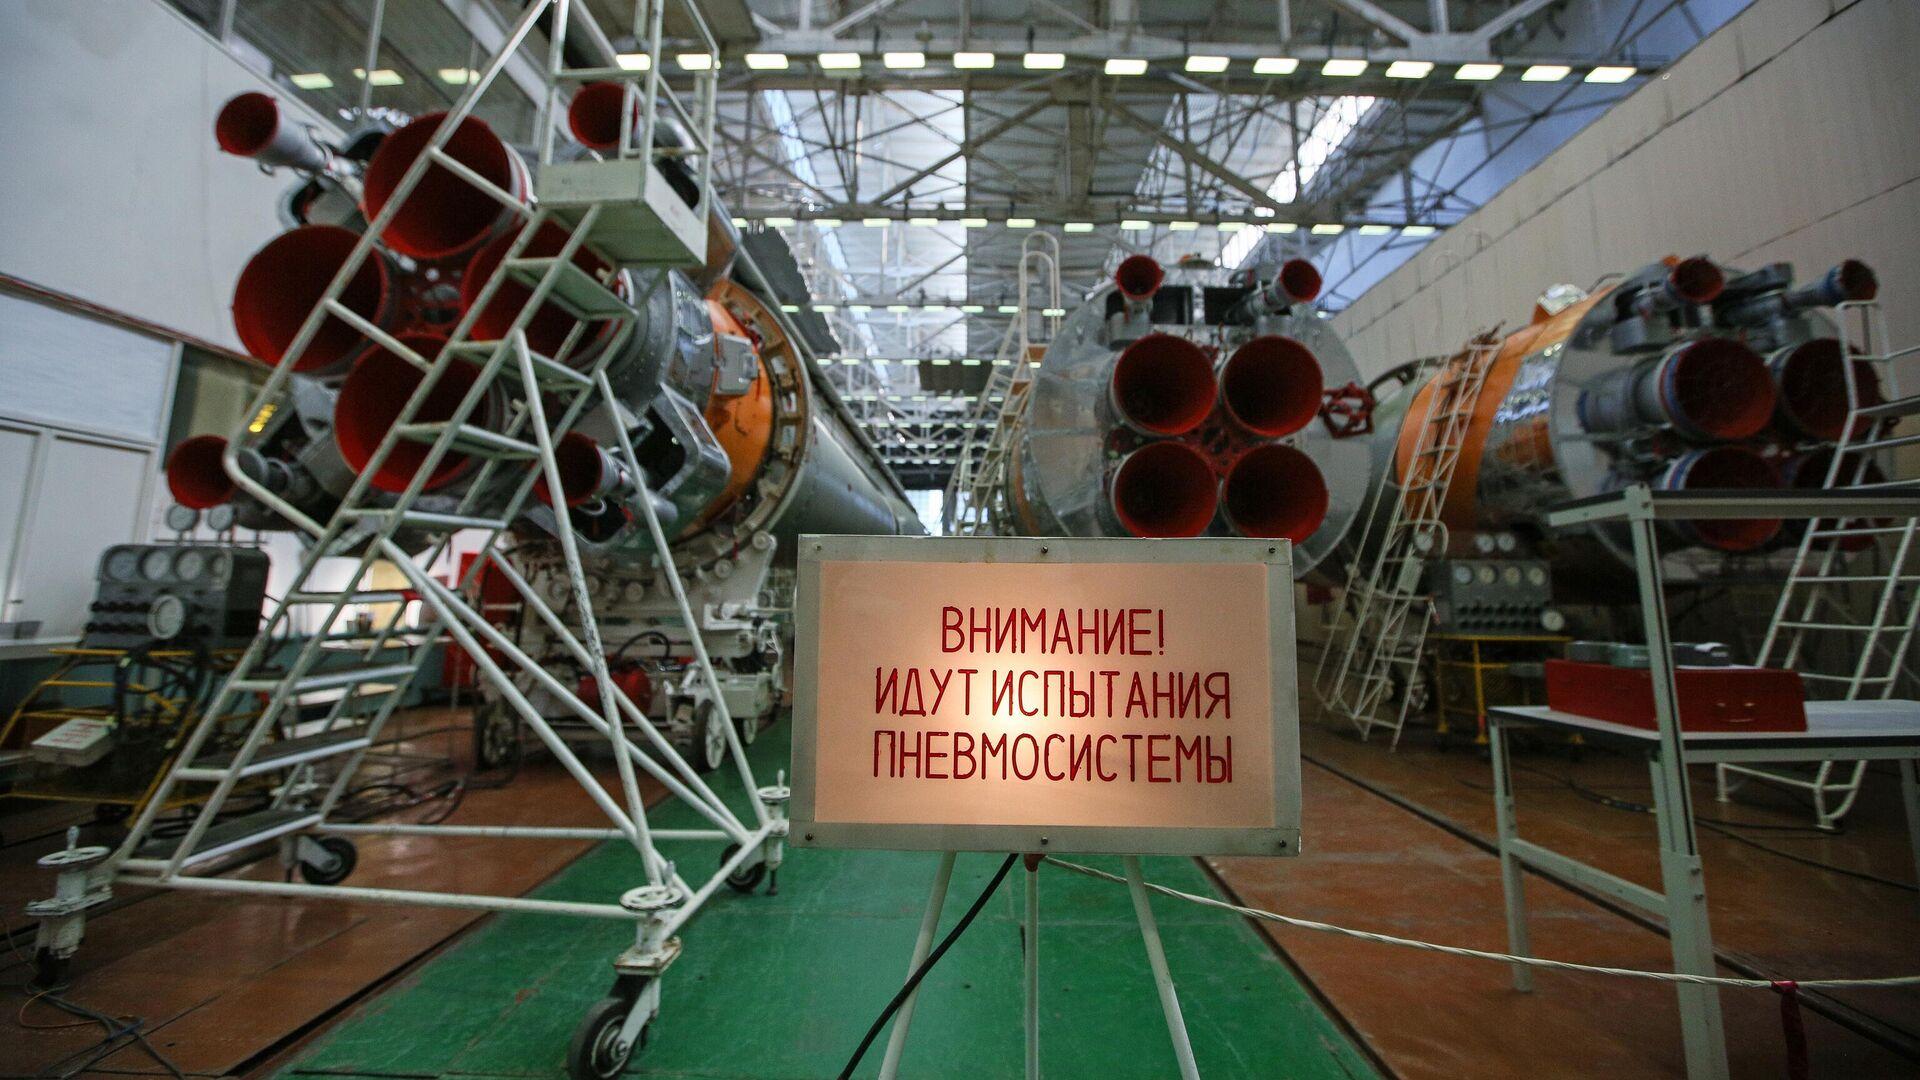 Сборка ракет-носителей Союз-2 на территории АО РКЦ Прогресс в Самаре - РИА Новости, 1920, 22.09.2020